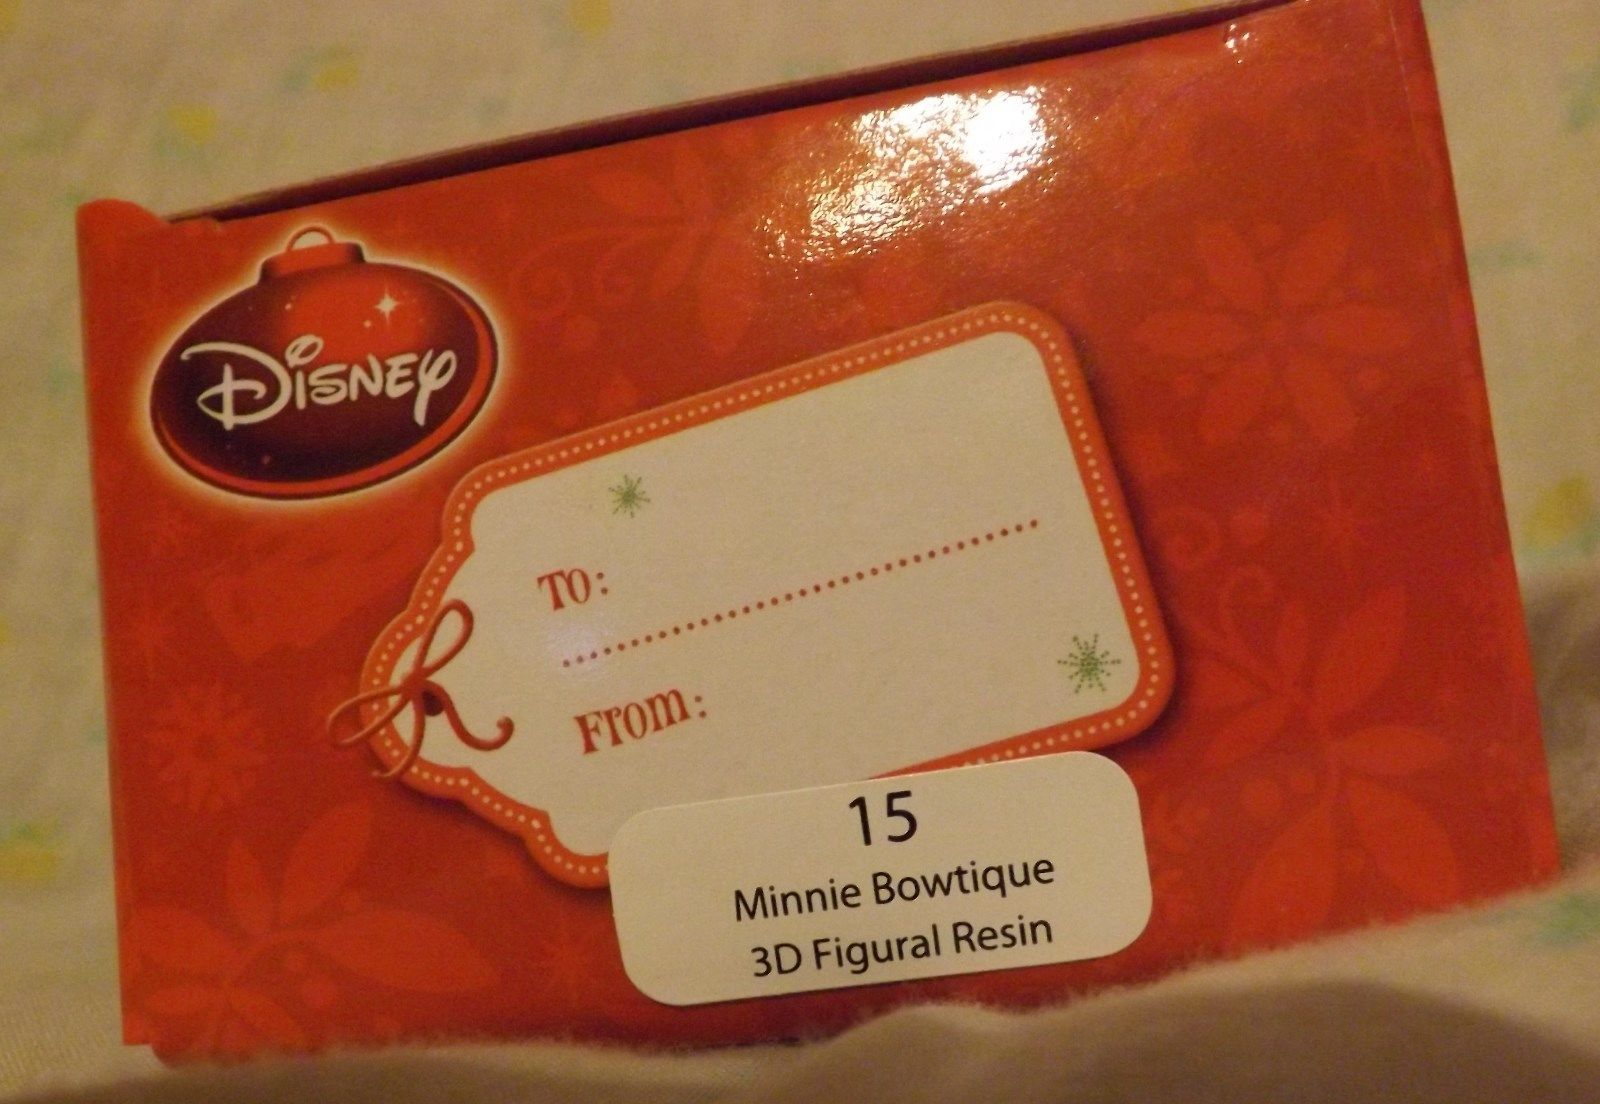 Disney Minnie Bowtique 3D Figural Resin Ornament 2013 image 2